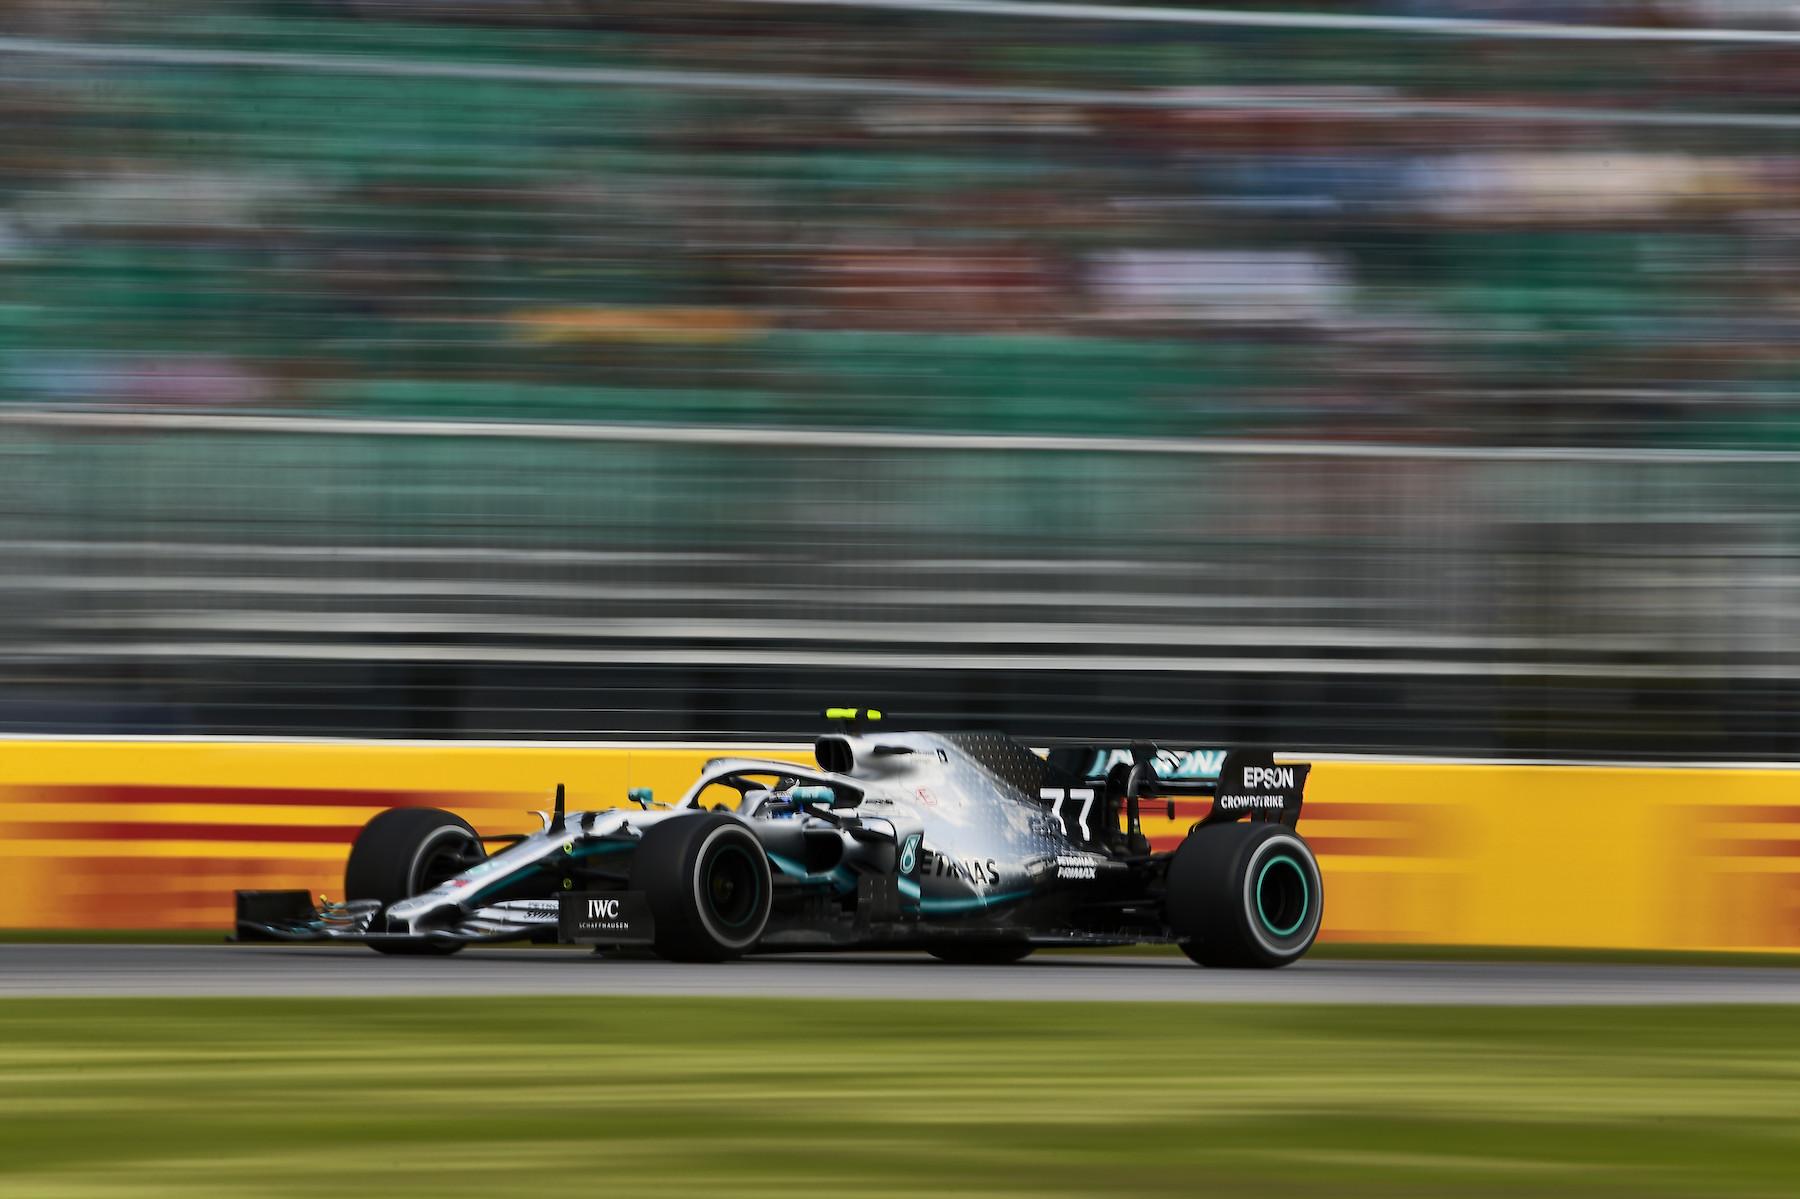 3 2019 Canadian GP 30.jpg